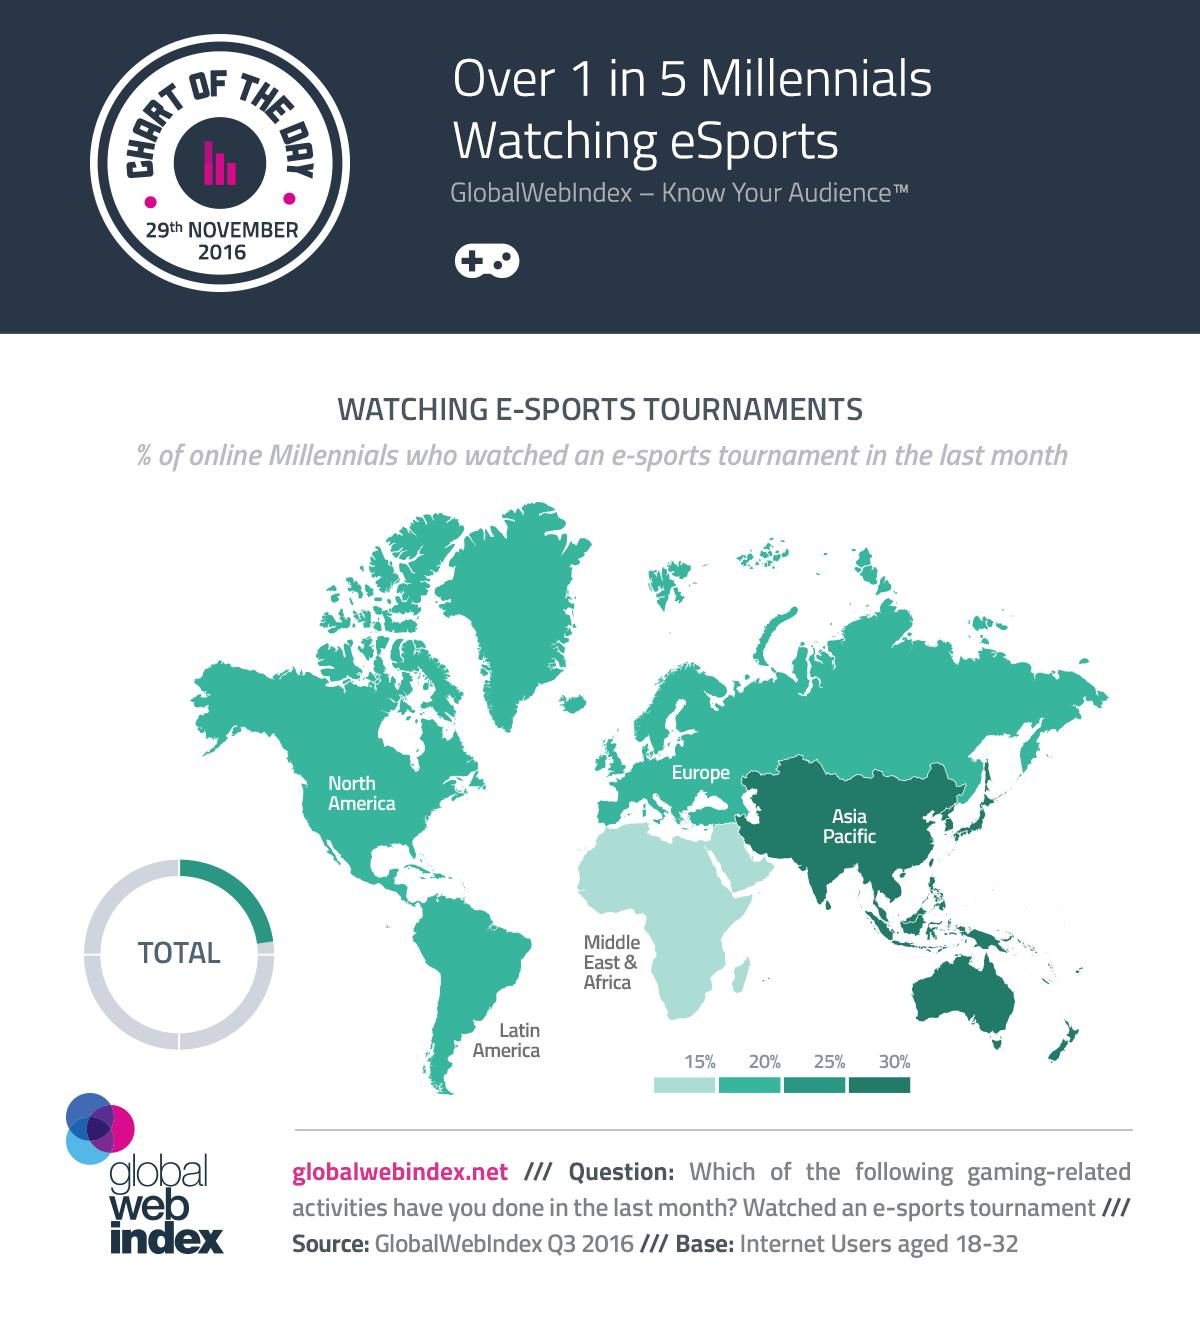 Over 1 in 5 Millennials Watching eSports